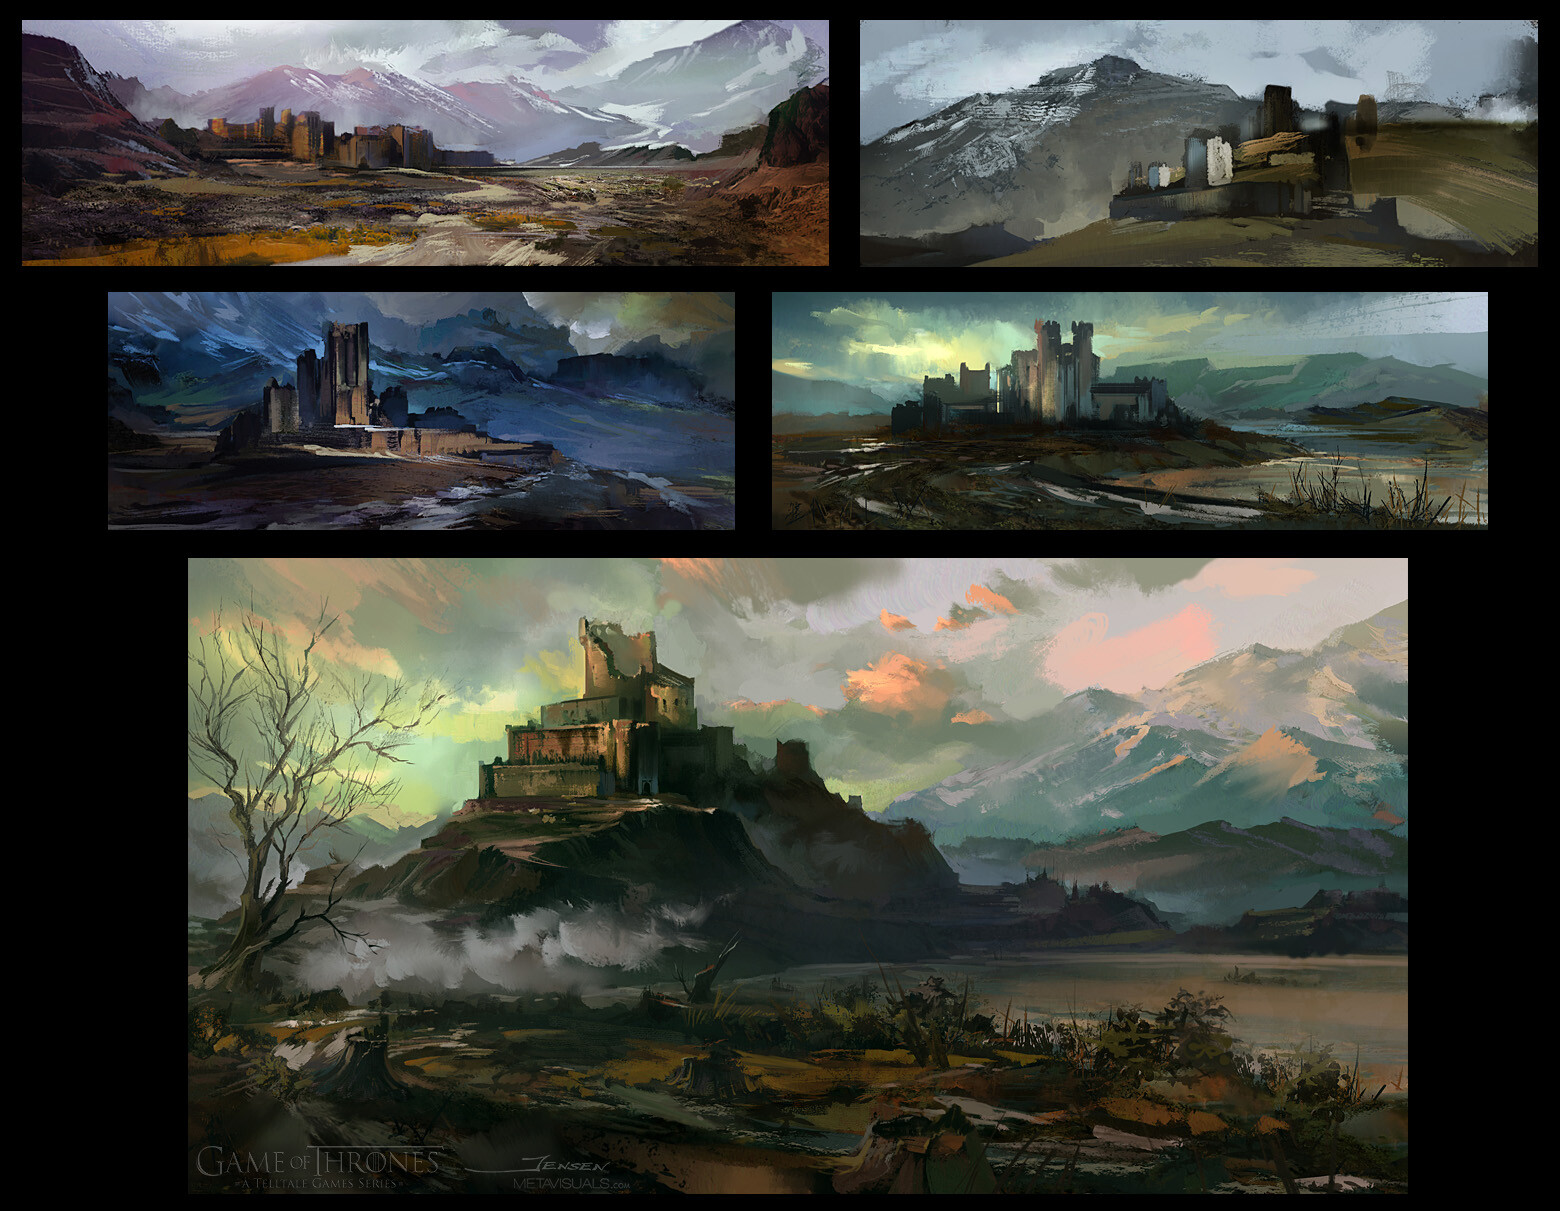 patrick-jensen-patrickjensen-metavisualsdotcom-gameofthrones-highpointvisdevsketches.jpg